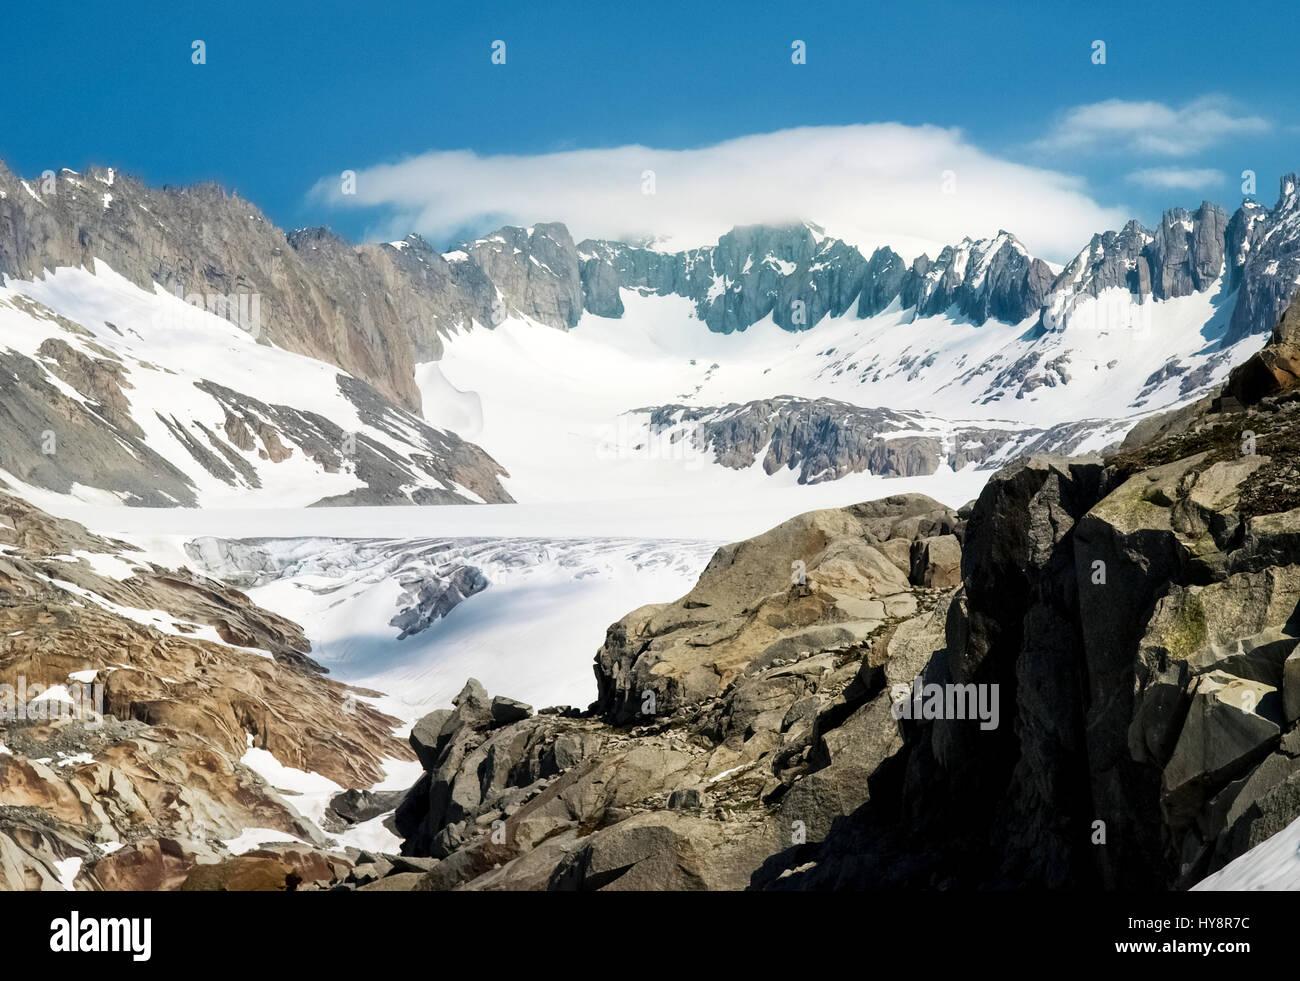 Switzerland: Canton Valais. Rhone glacier melting due to the melting of glaciers. Stock Photo